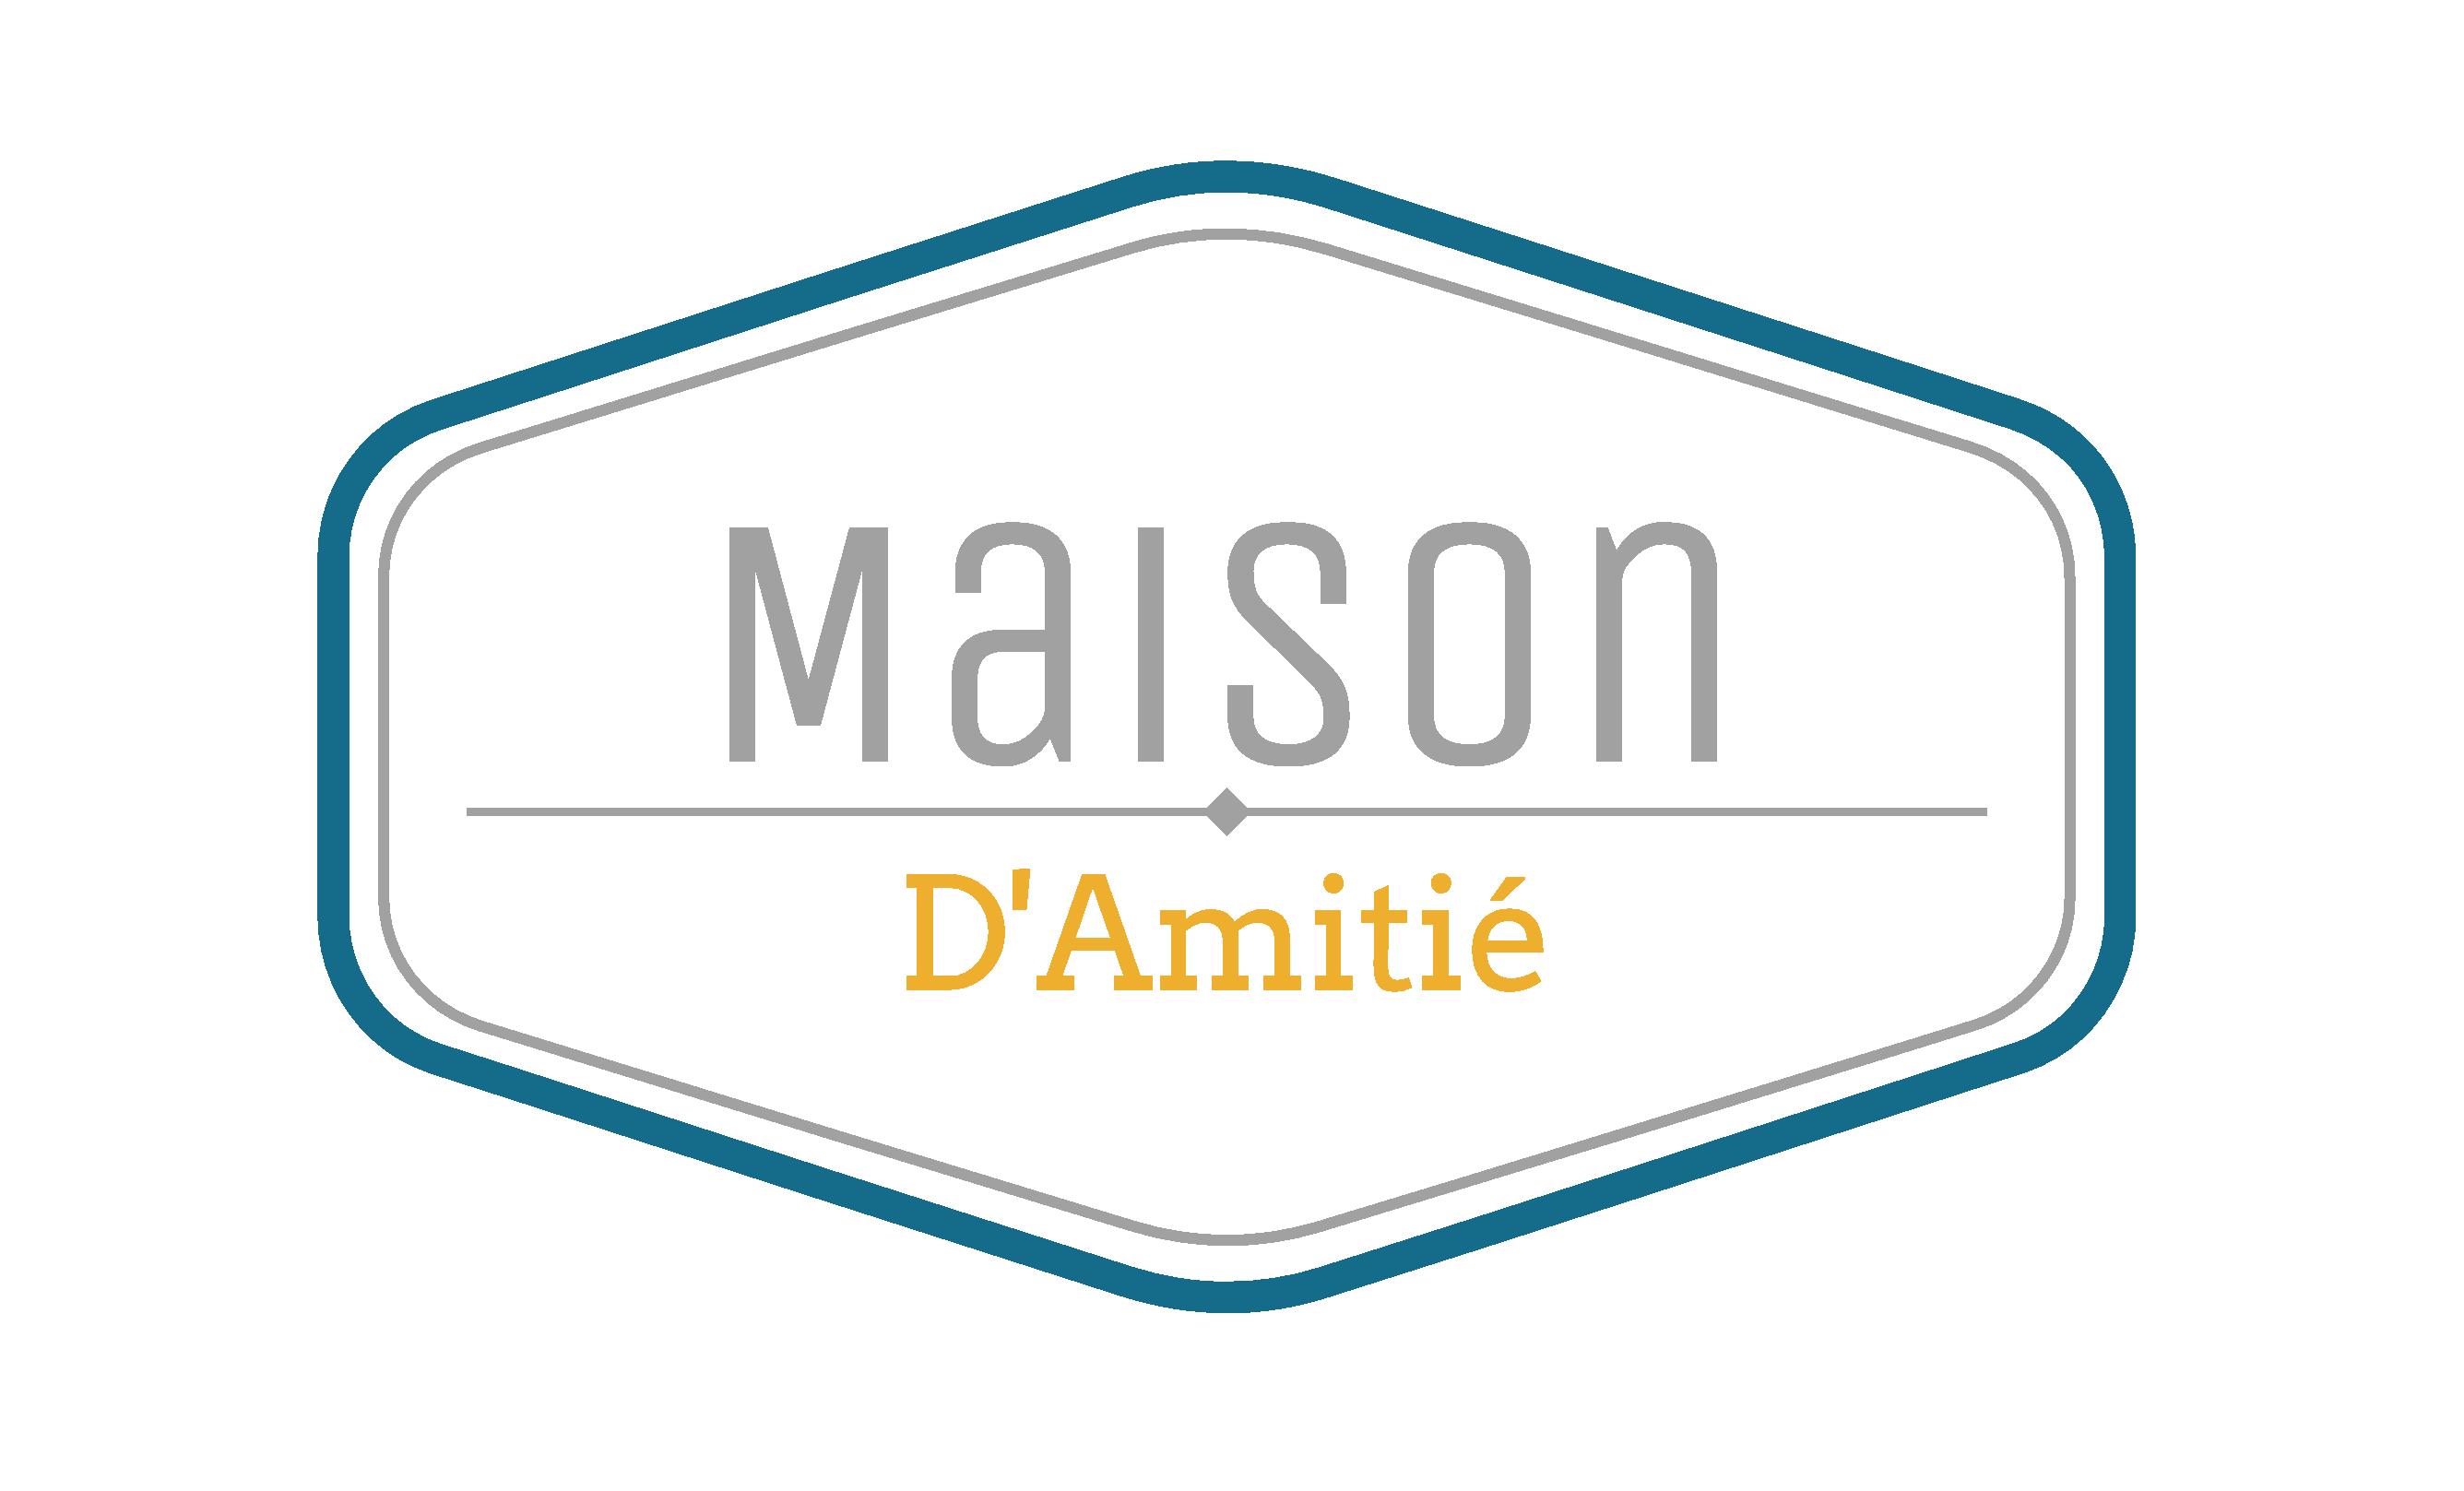 Middelkerke - Huis / Maison - Maison d'Amitie